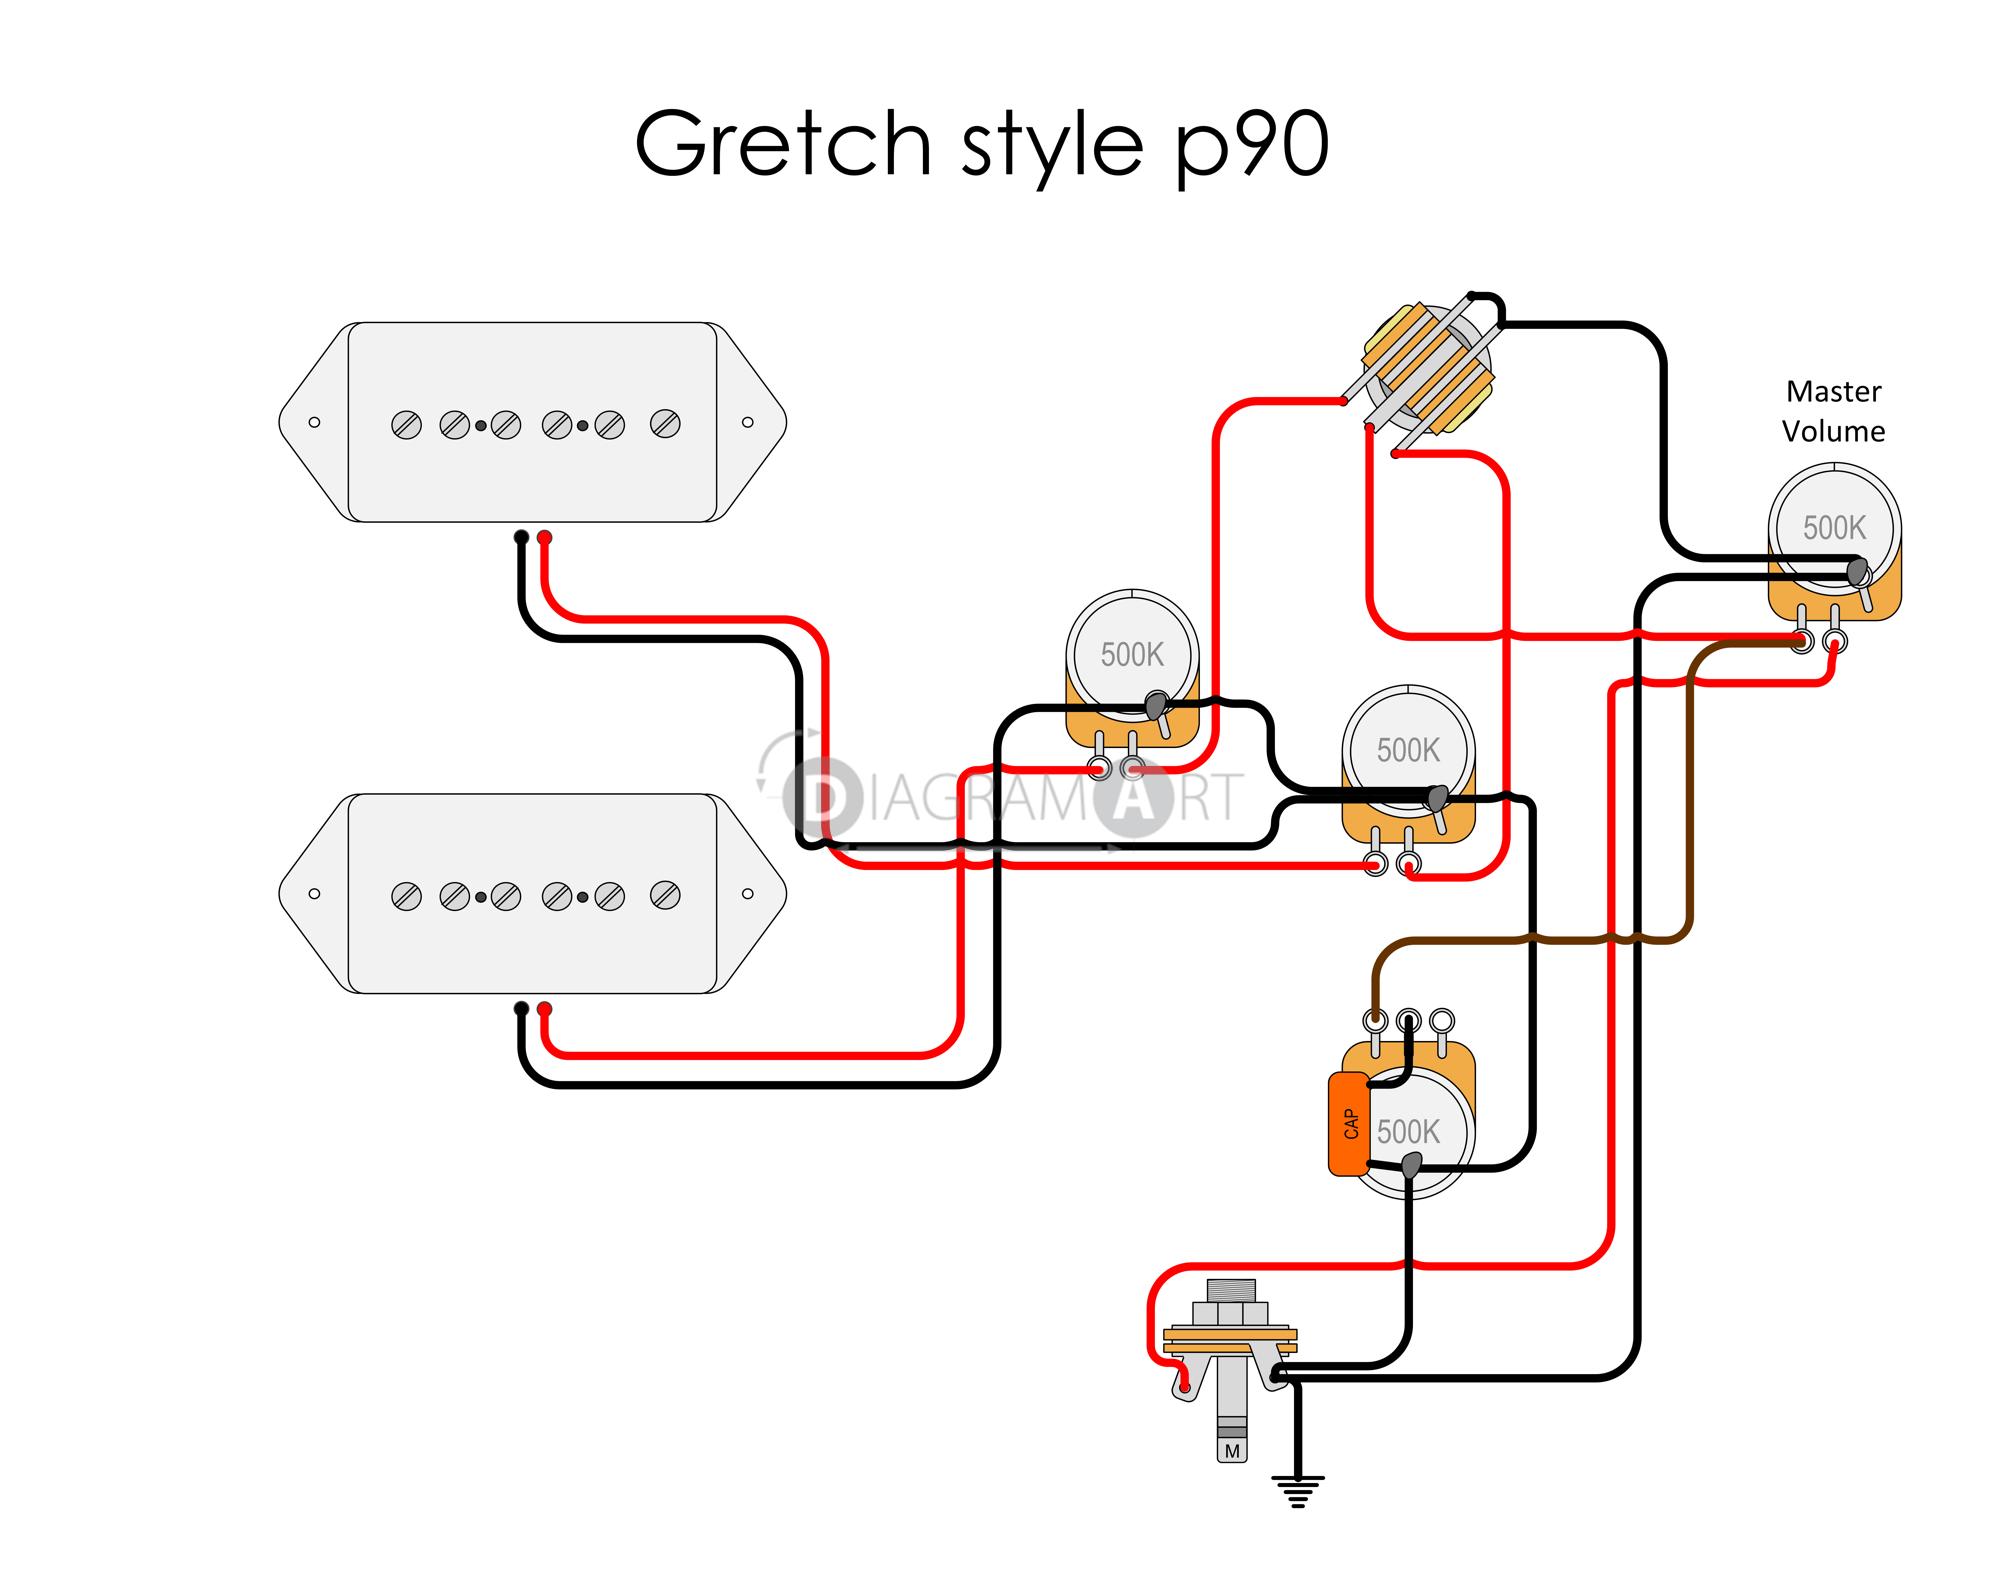 p90 tbx wiring diagram wh 7772  p90 wiringgif  wh 7772  p90 wiringgif